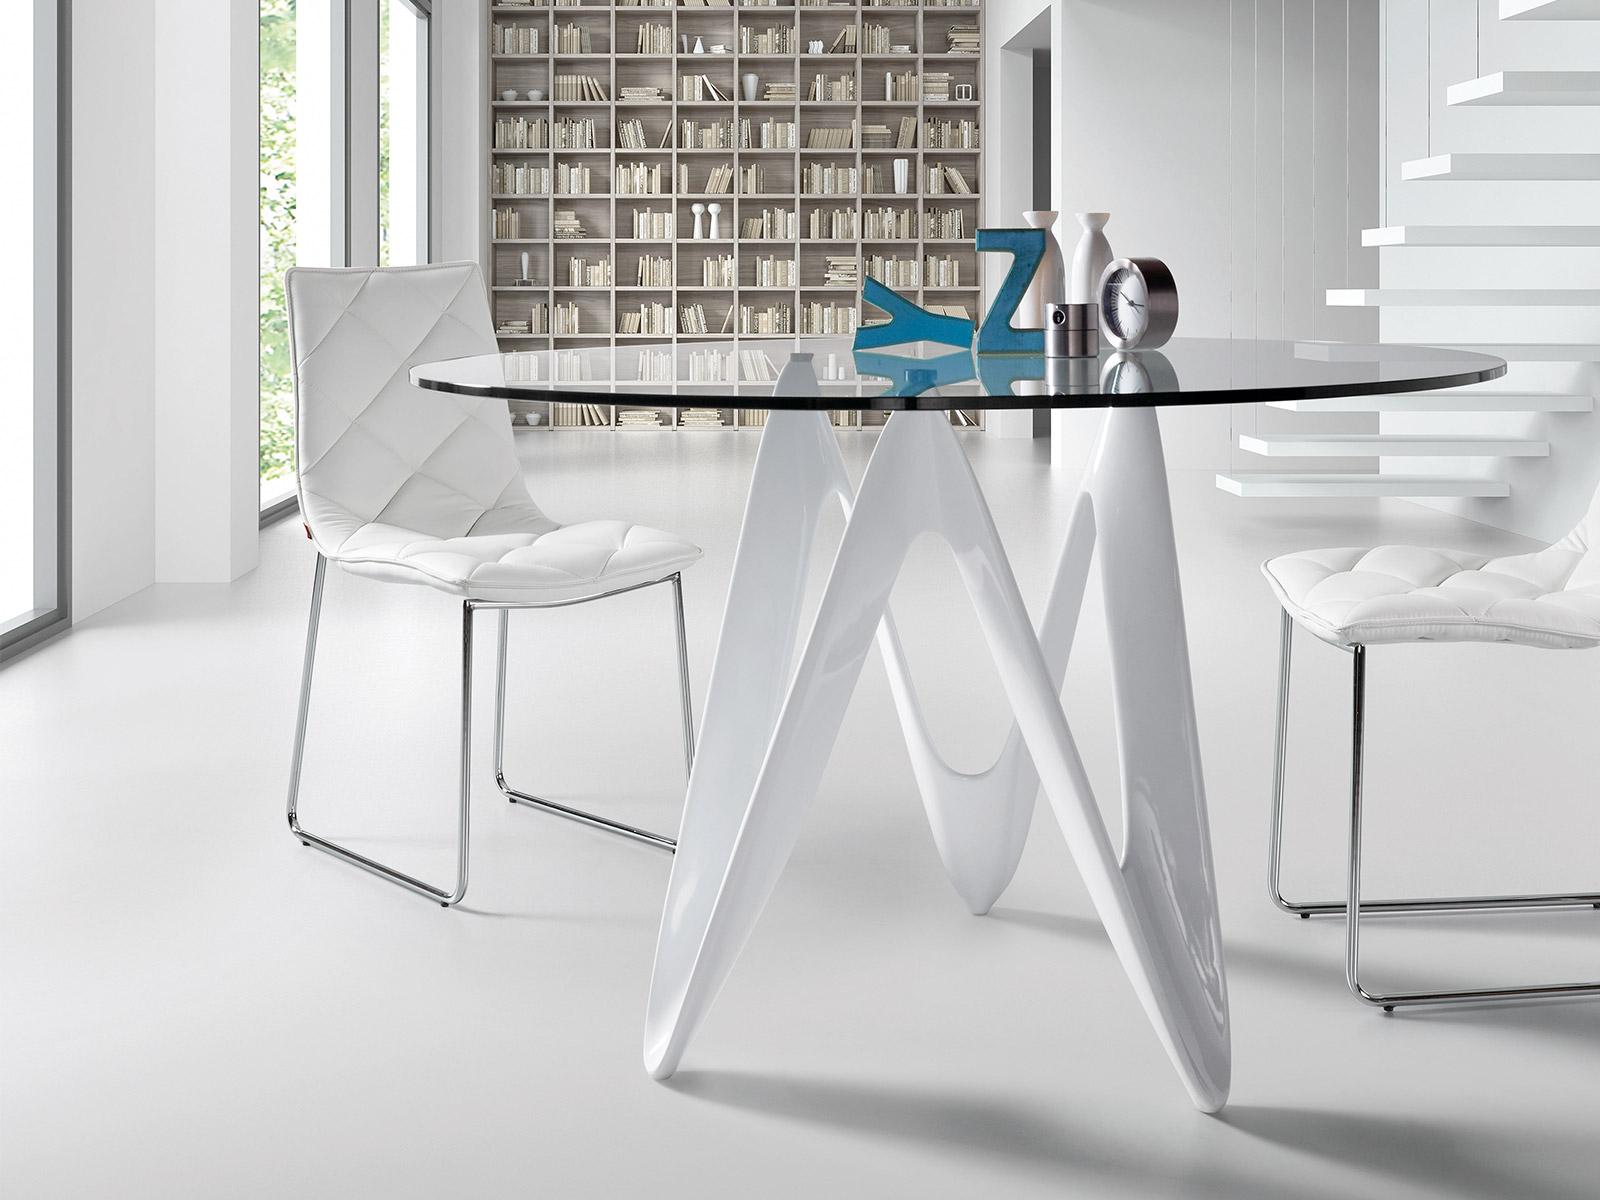 Mesa de comedor eos casam a design compra muebles - Mesas de comedor online ...